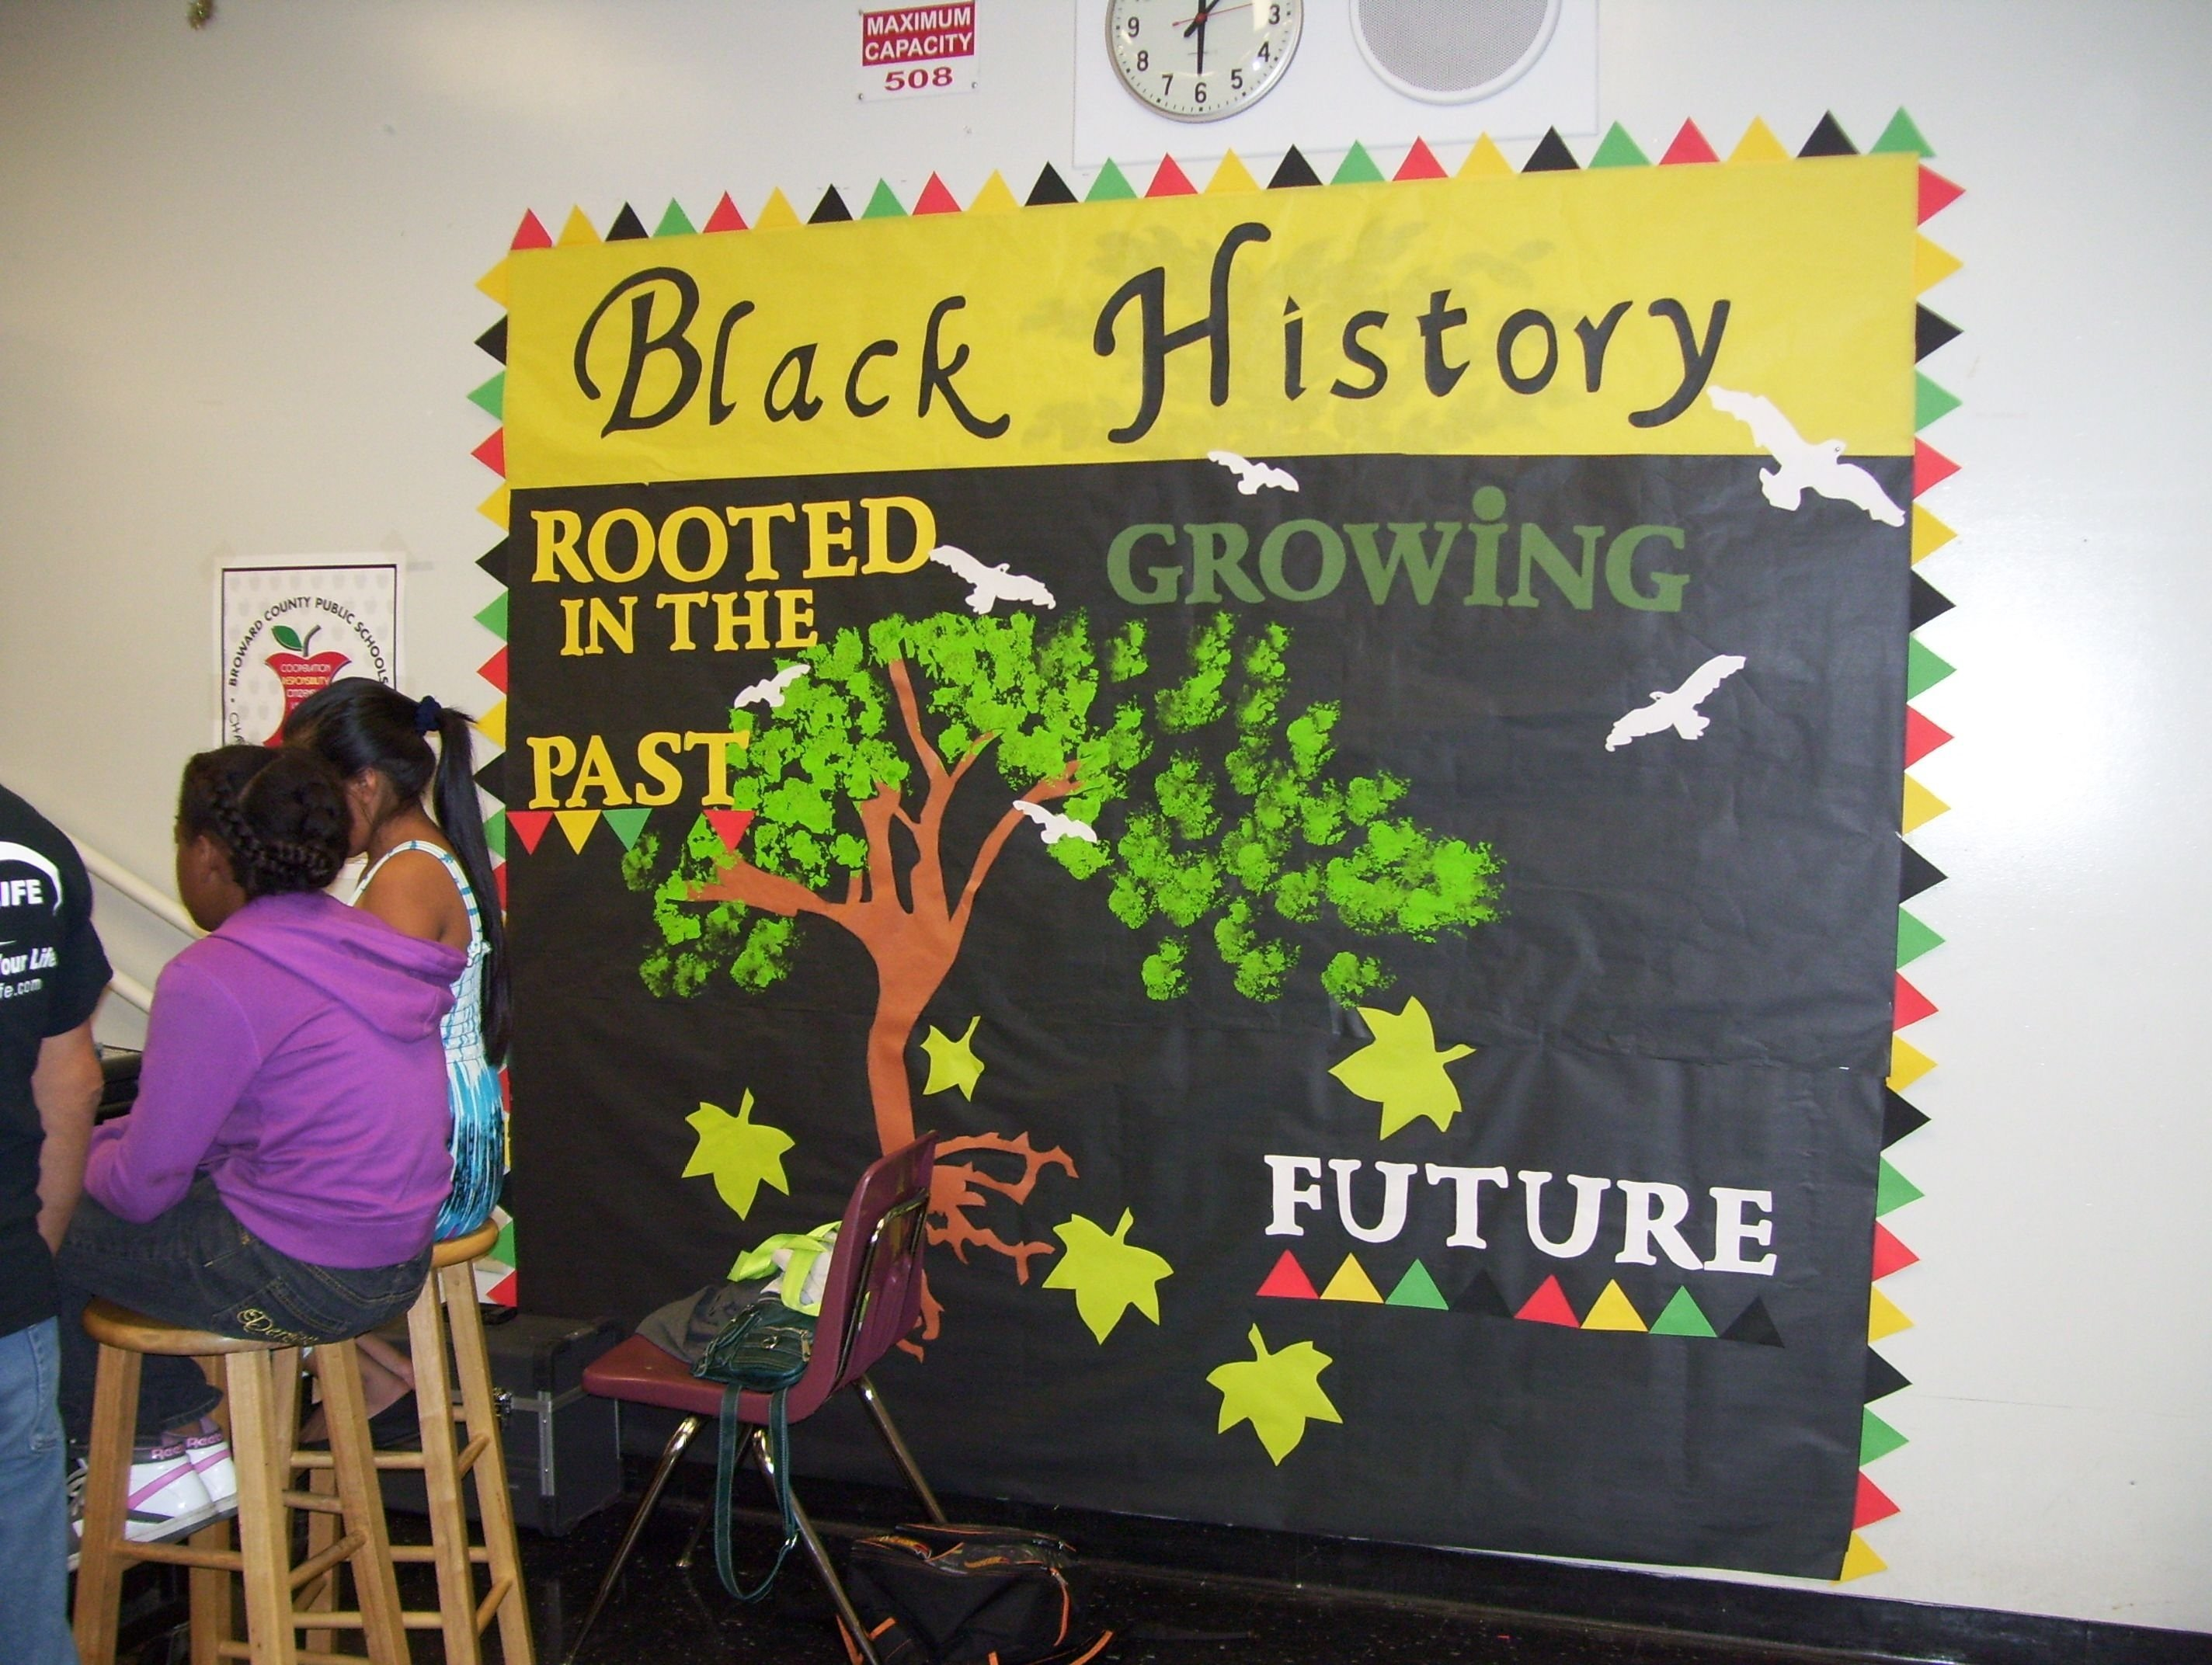 10 Unique Black History Bulletin Board Ideas black history month ideas education pinterest black history 7 2020